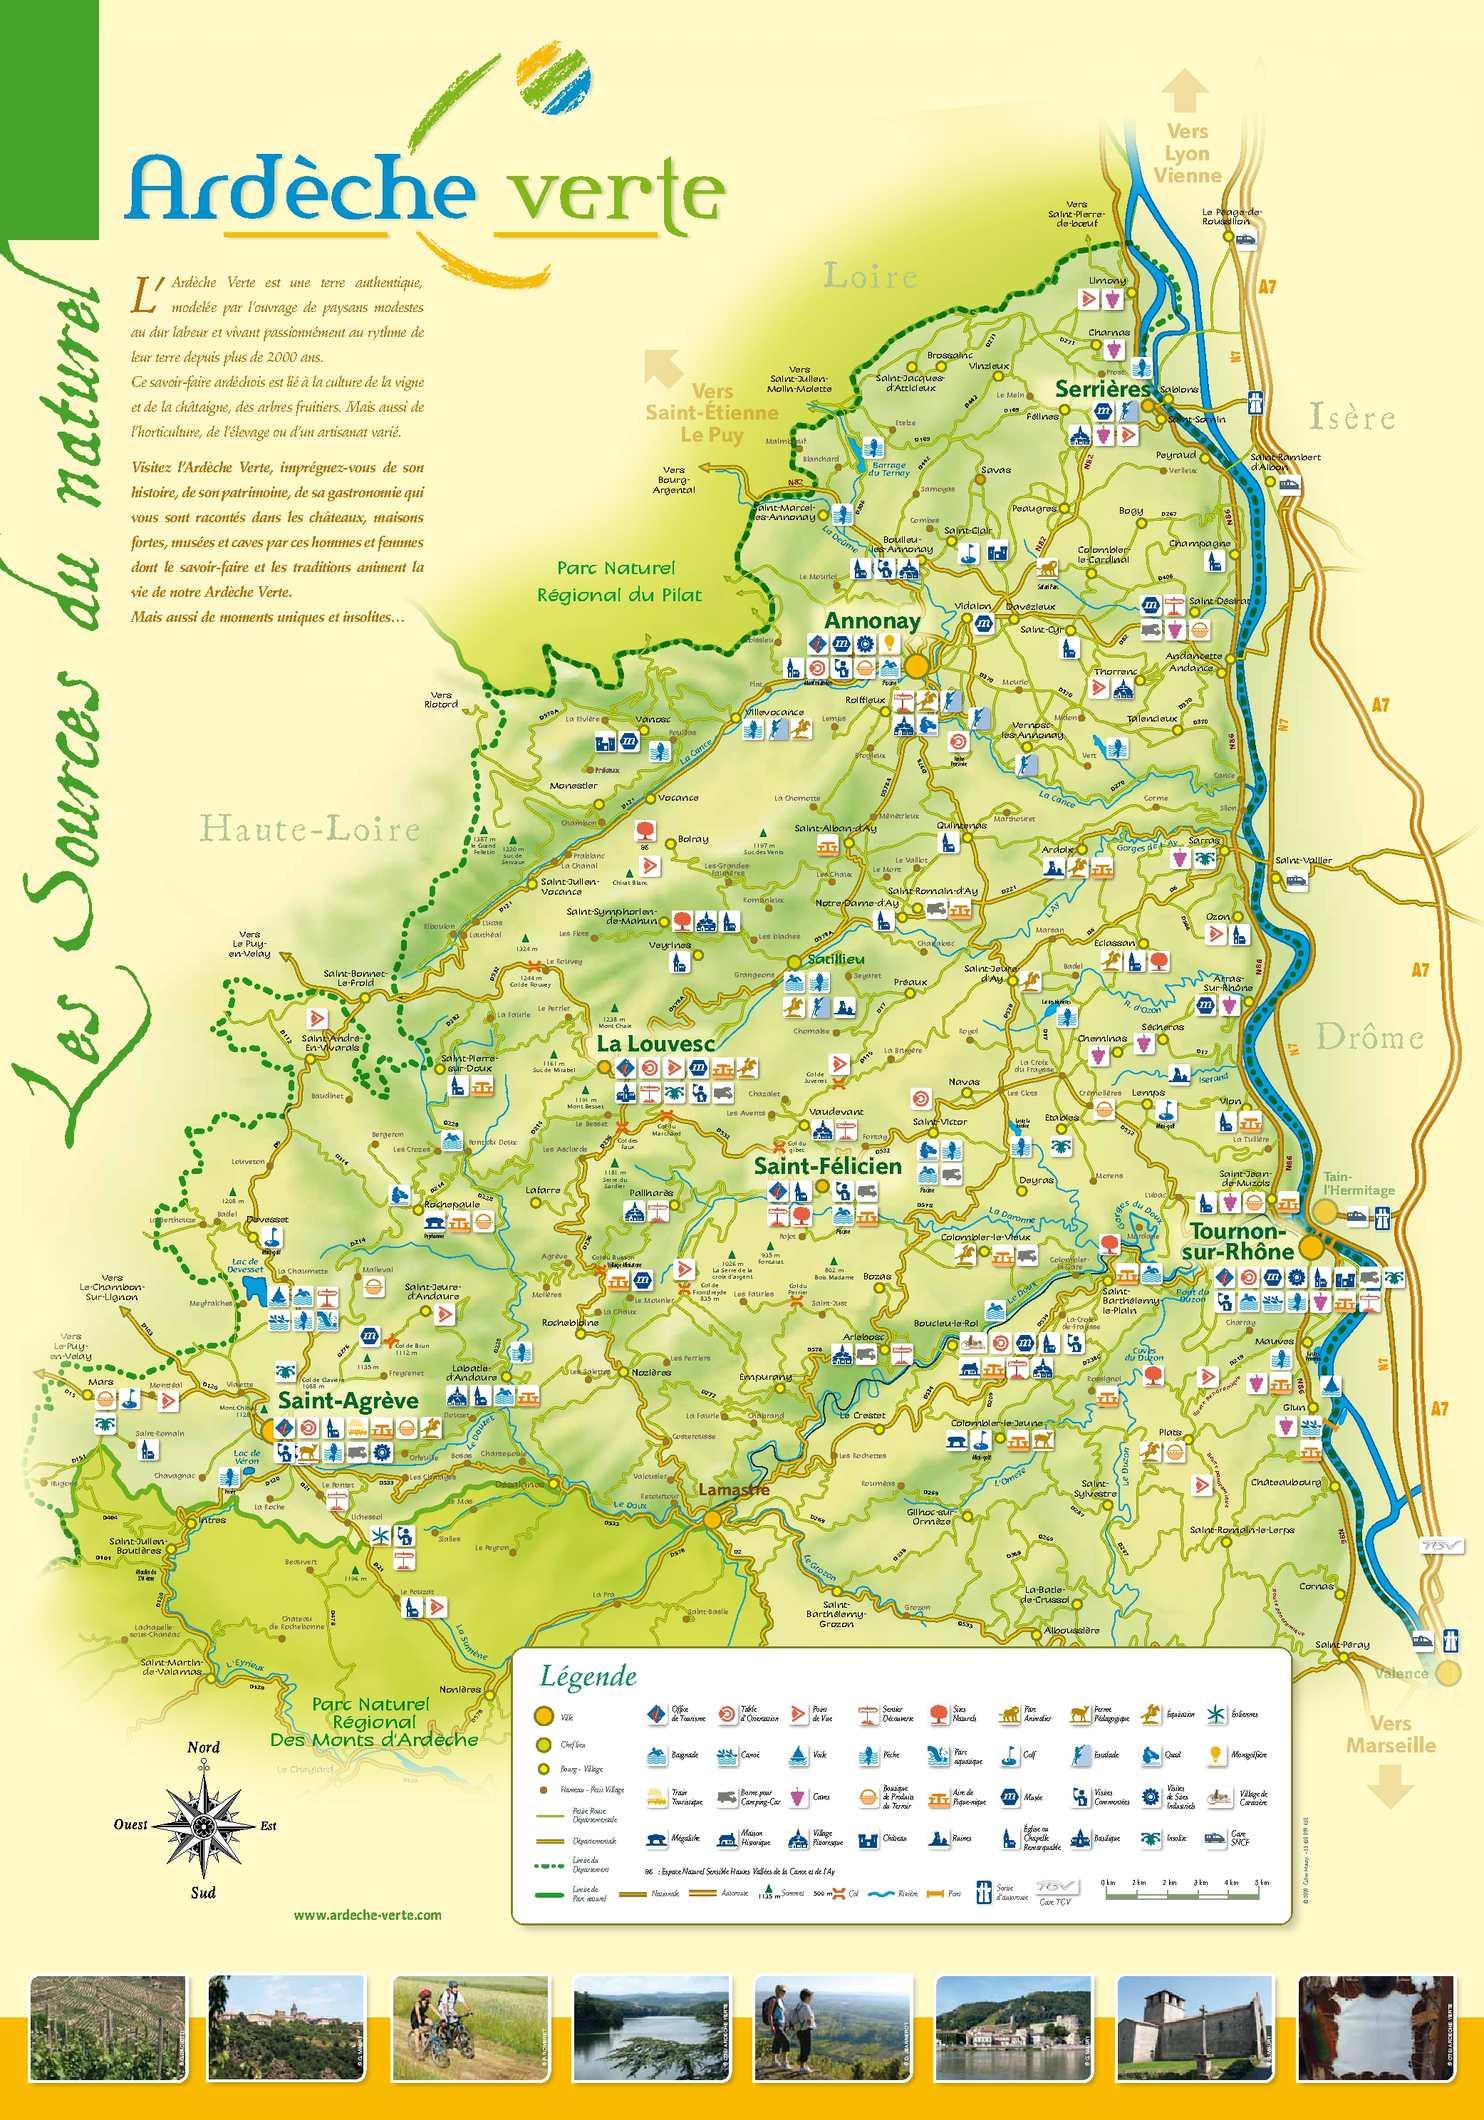 Calam o carte touristique de l 39 ard che verte - Office du tourisme ardeche nord ...